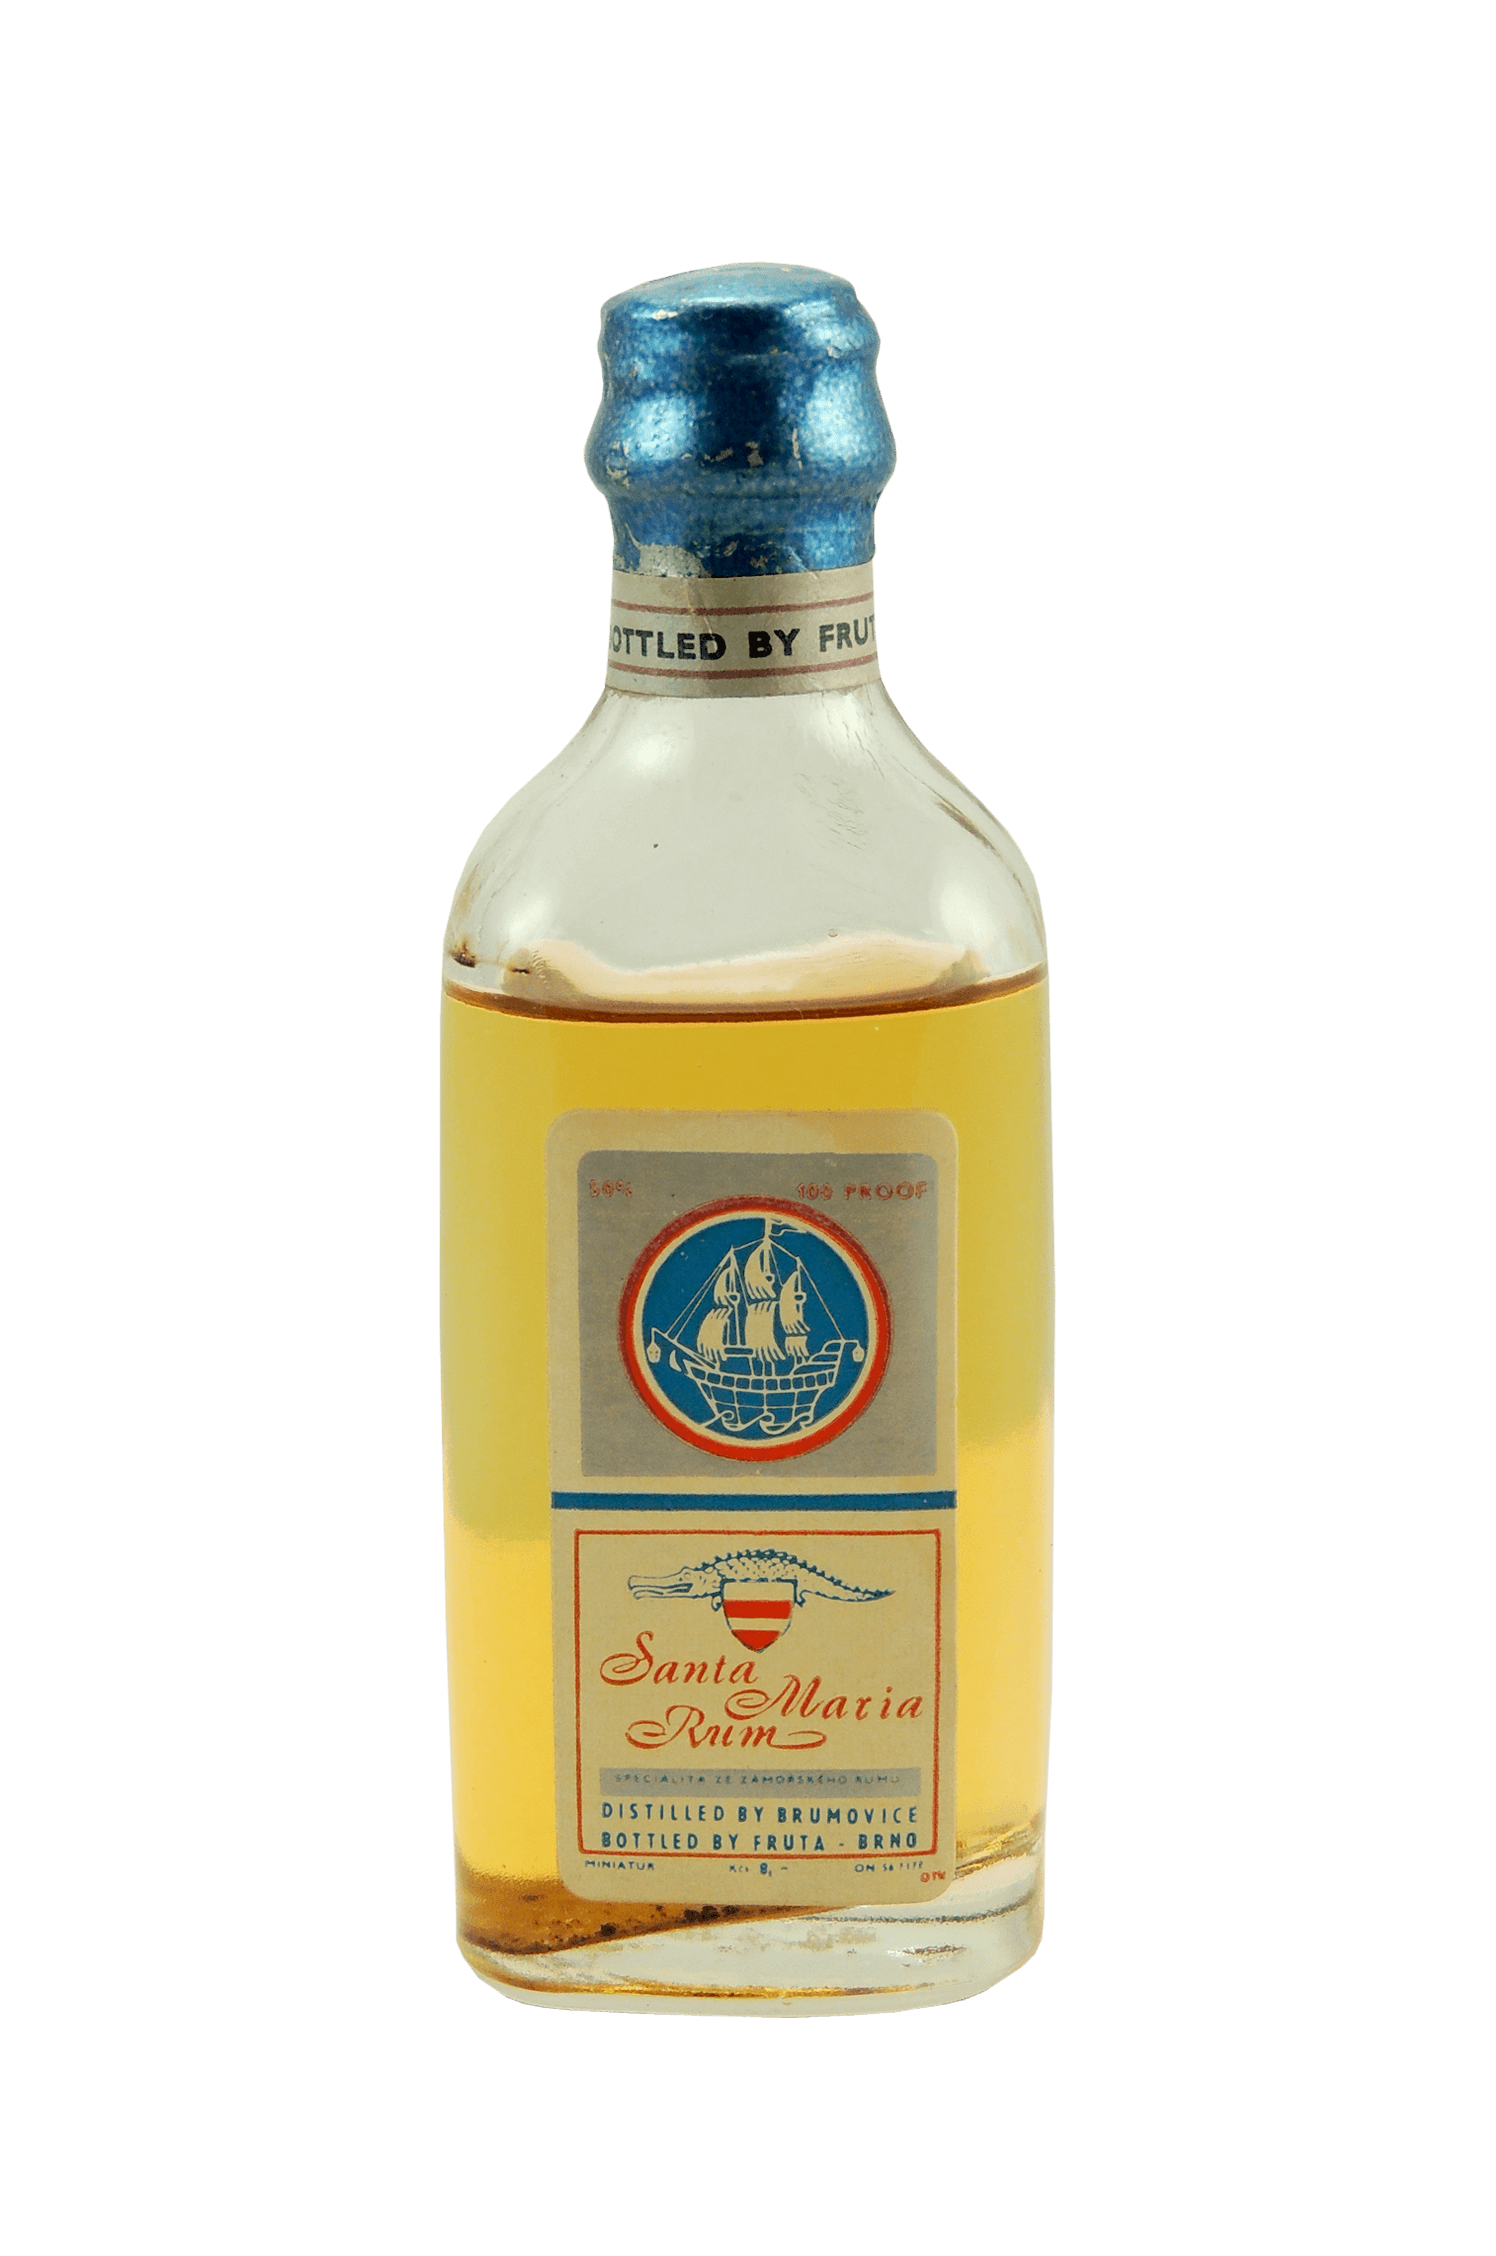 Santa Maria Rum